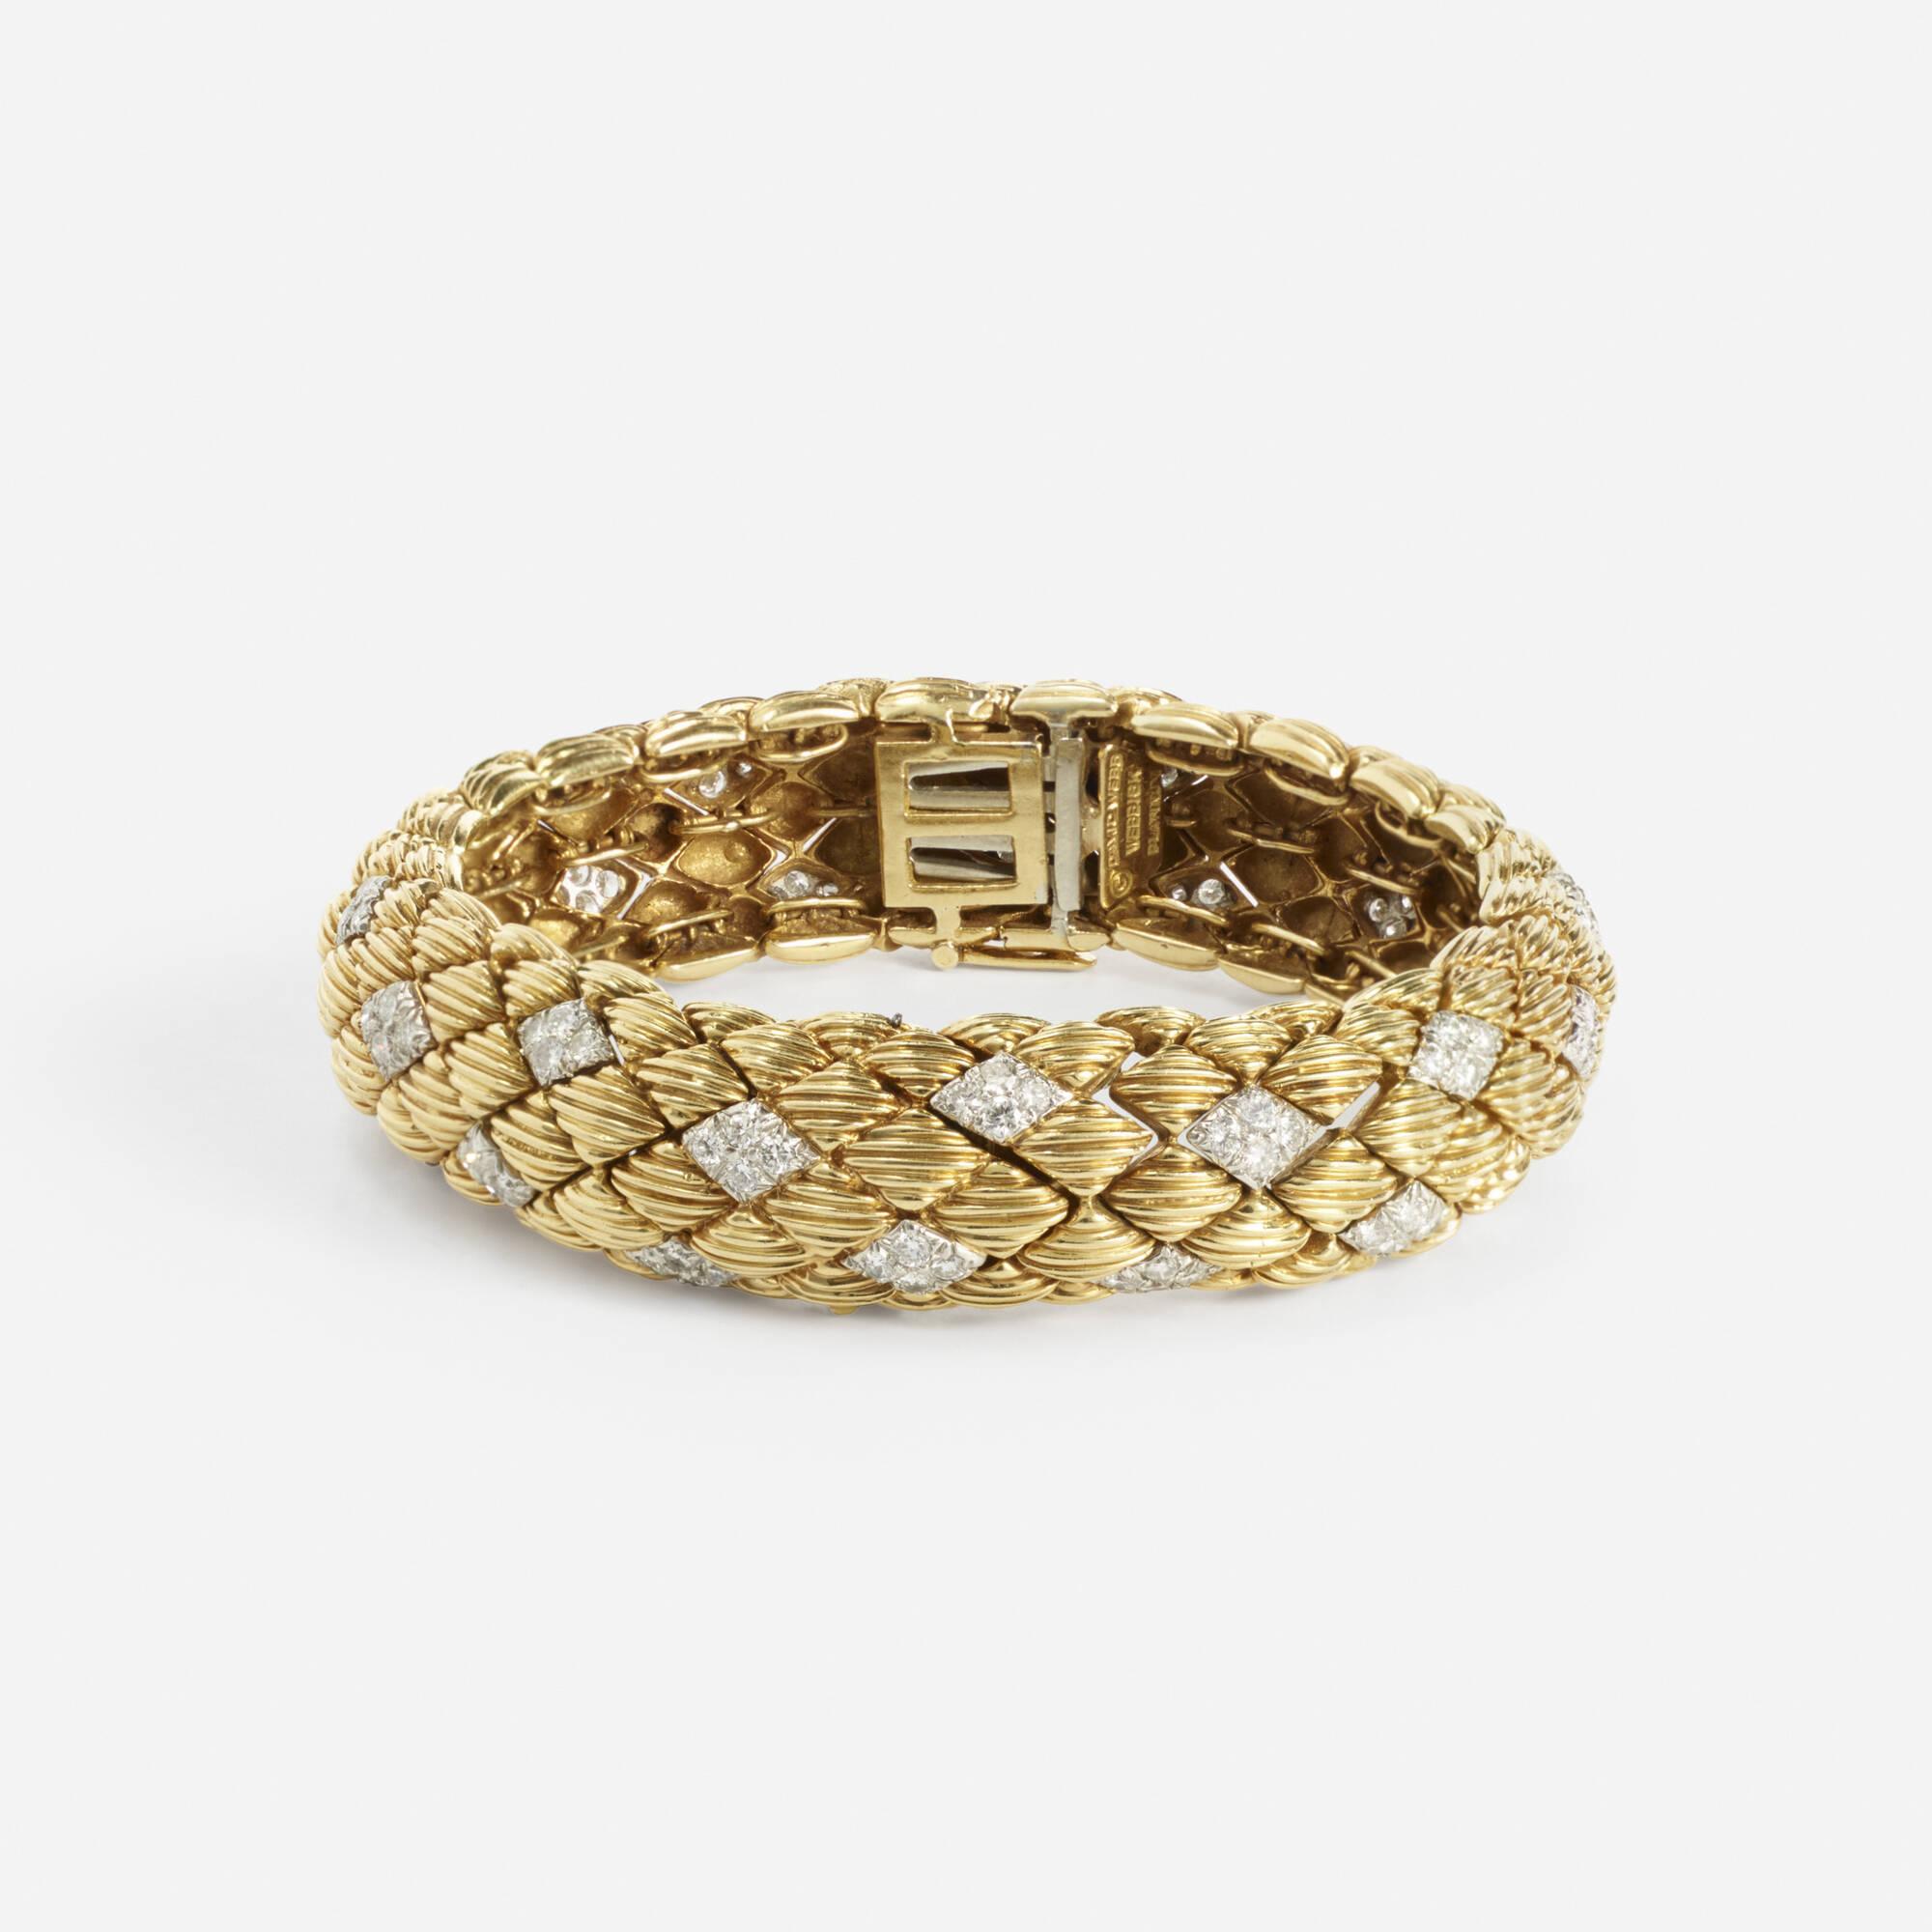 191: David Webb / A gold, platinum and diamond bracelet watch (1 of 1)